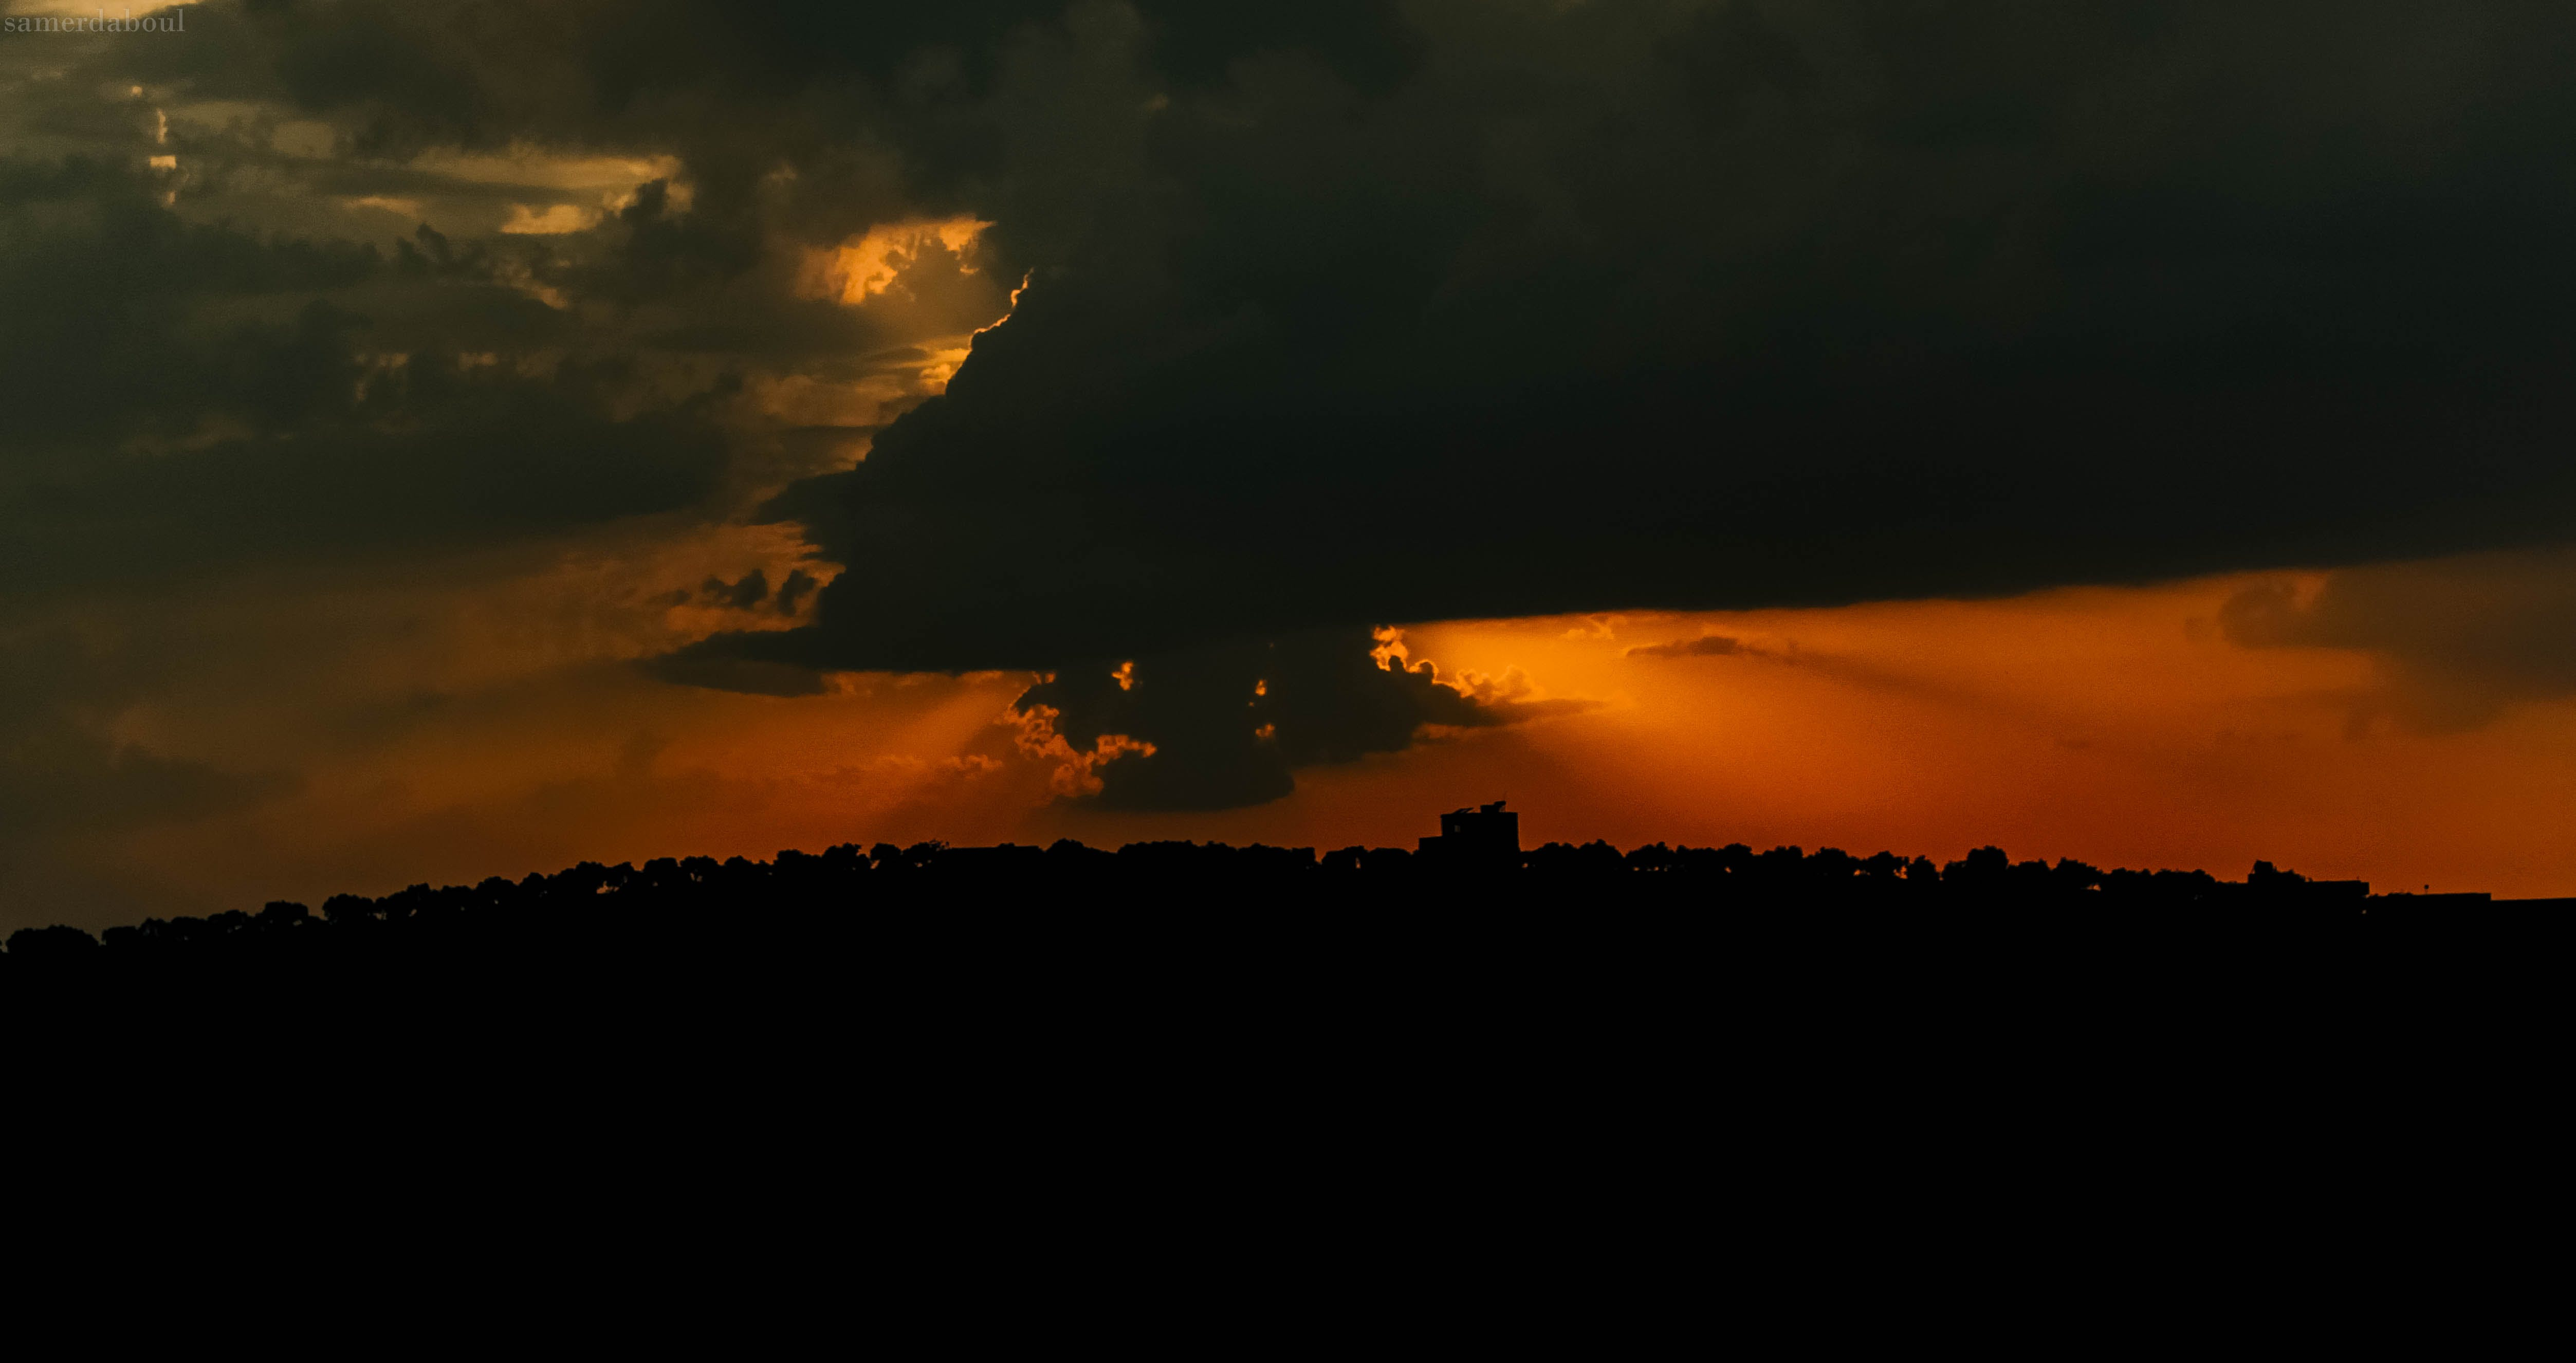 clouds, color, dark